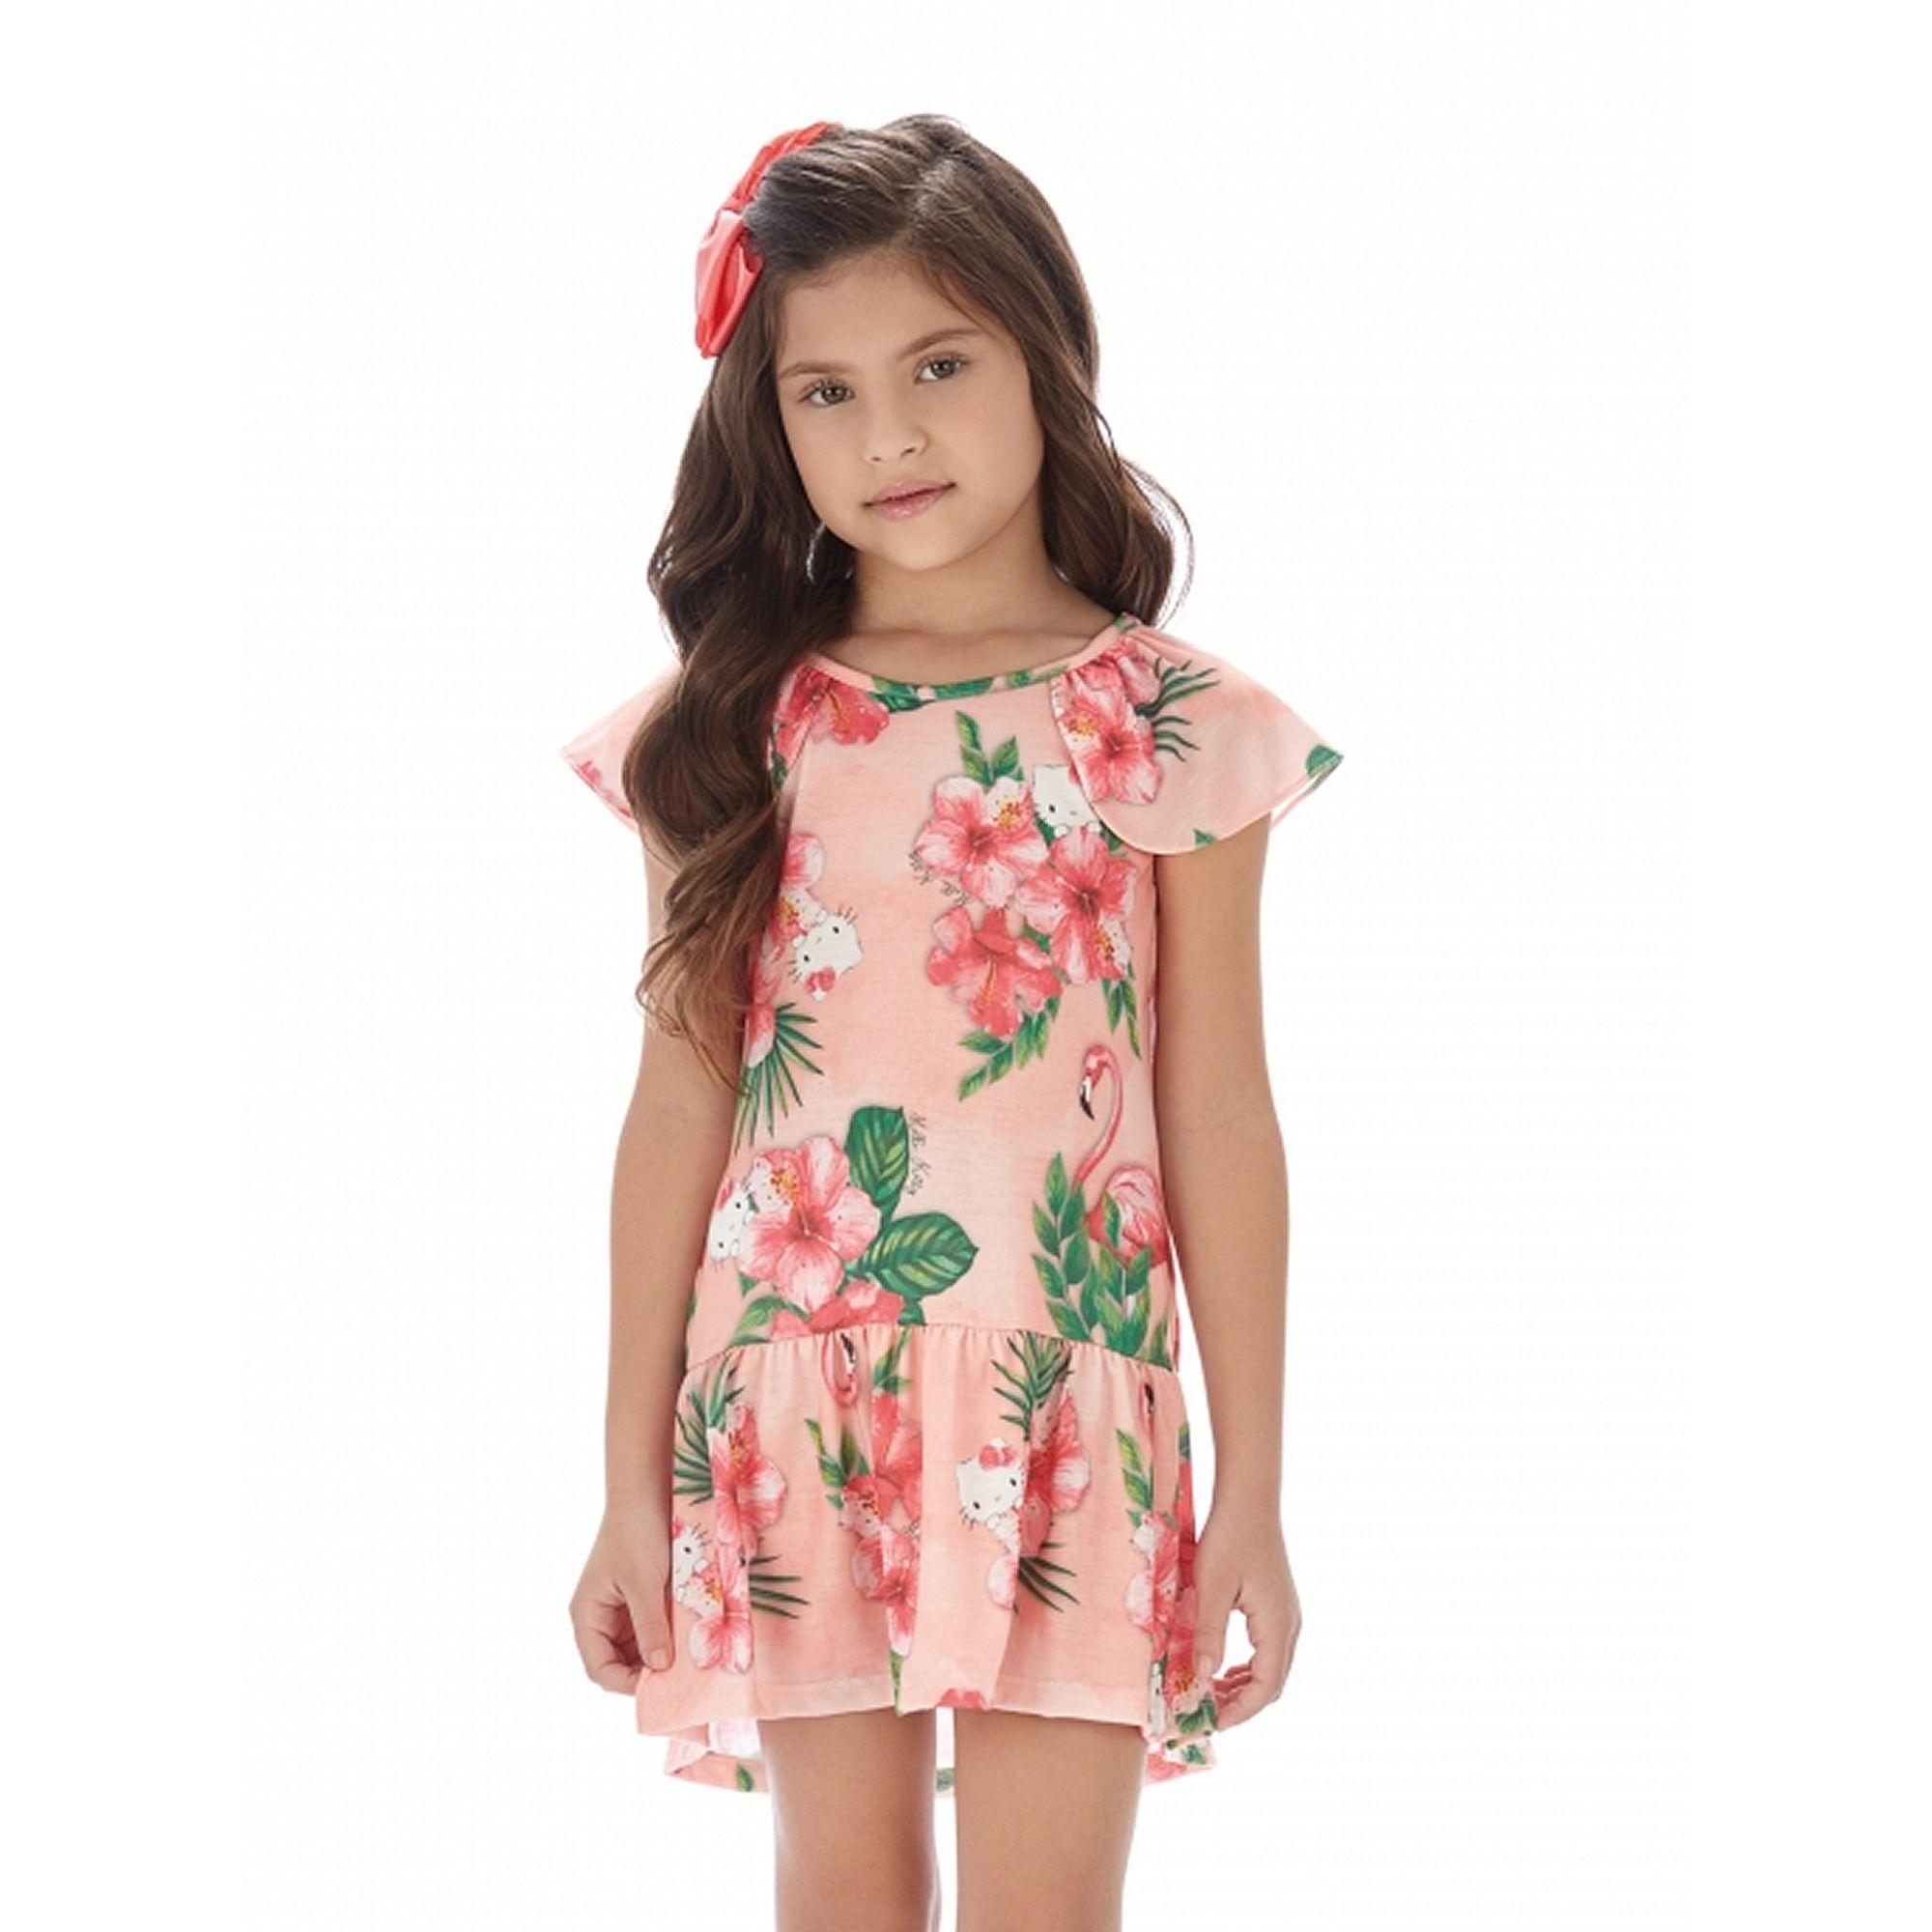 vestido-infantil-verao-hello-kitty-floral-pessego